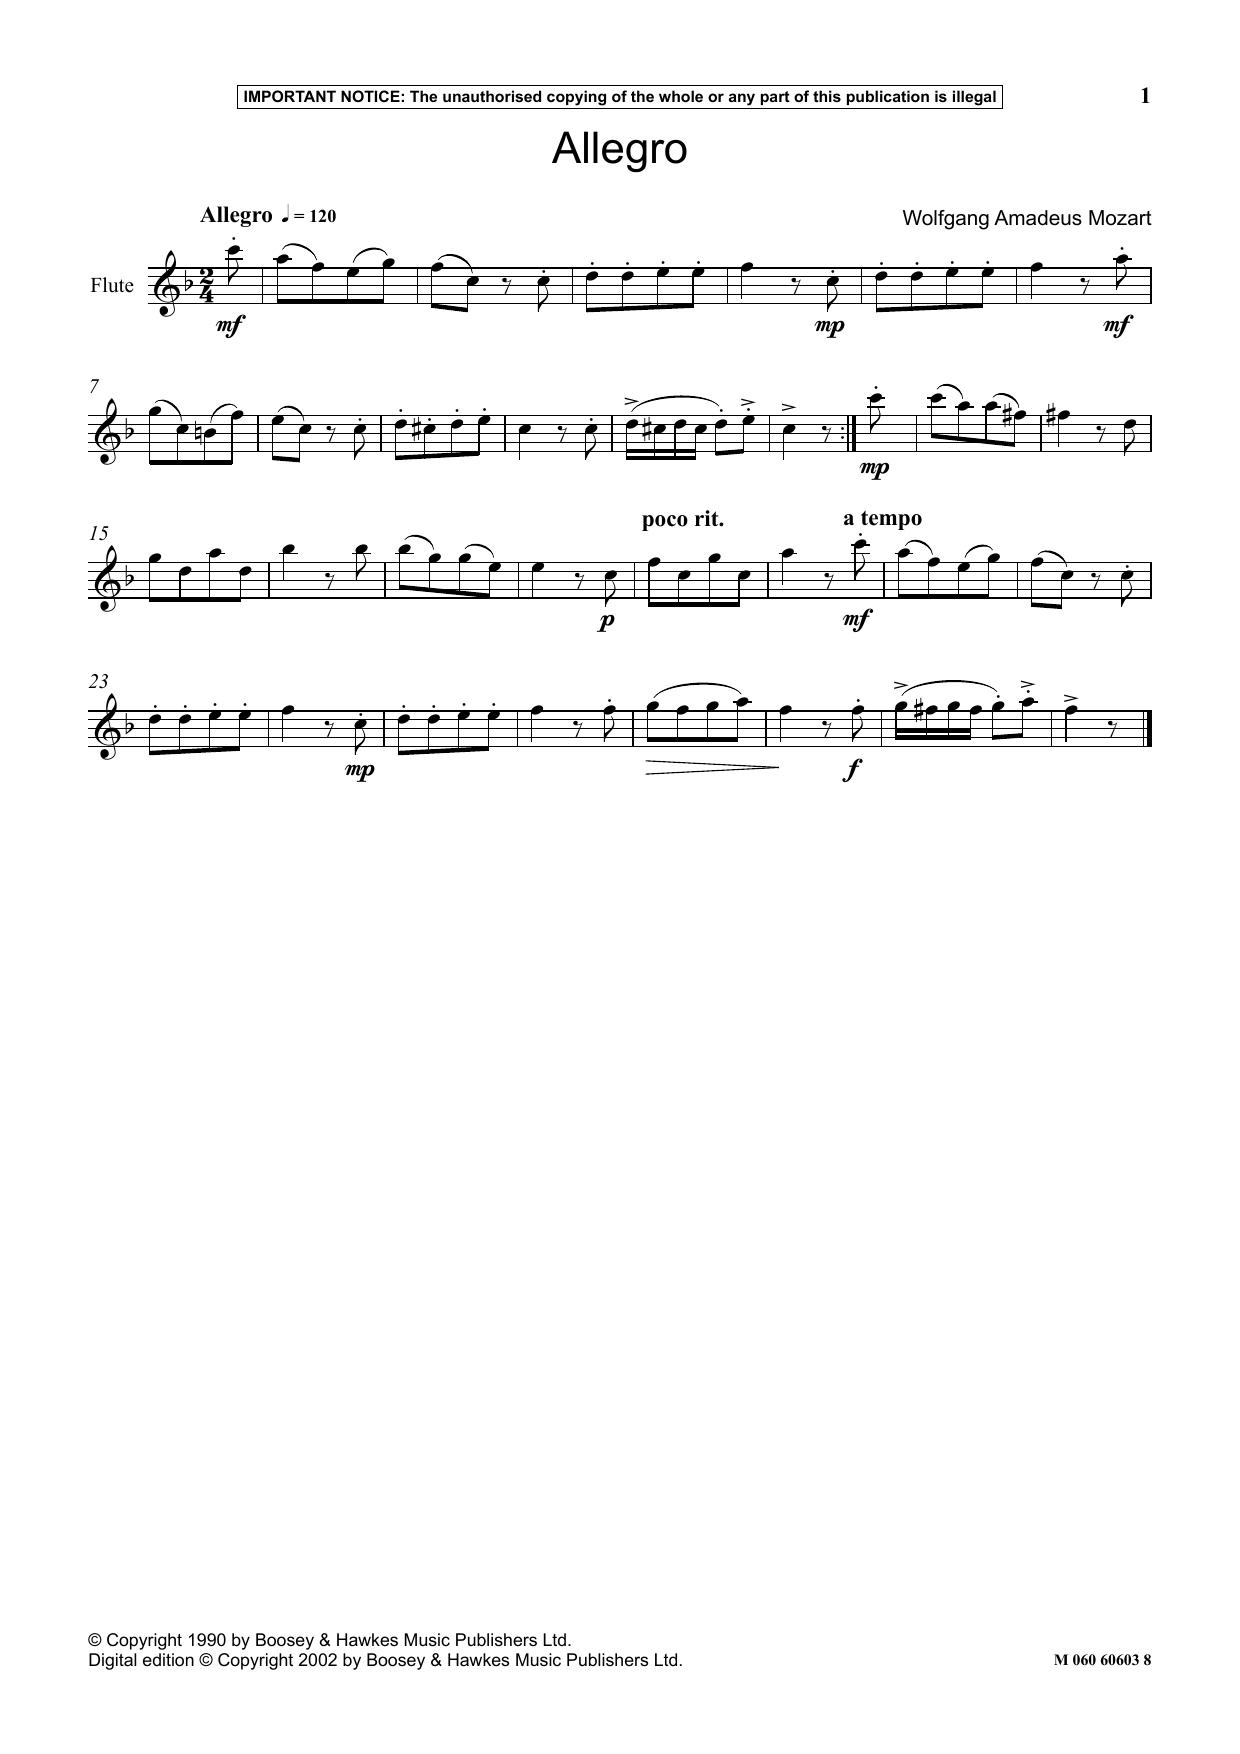 Allegro Sheet Music